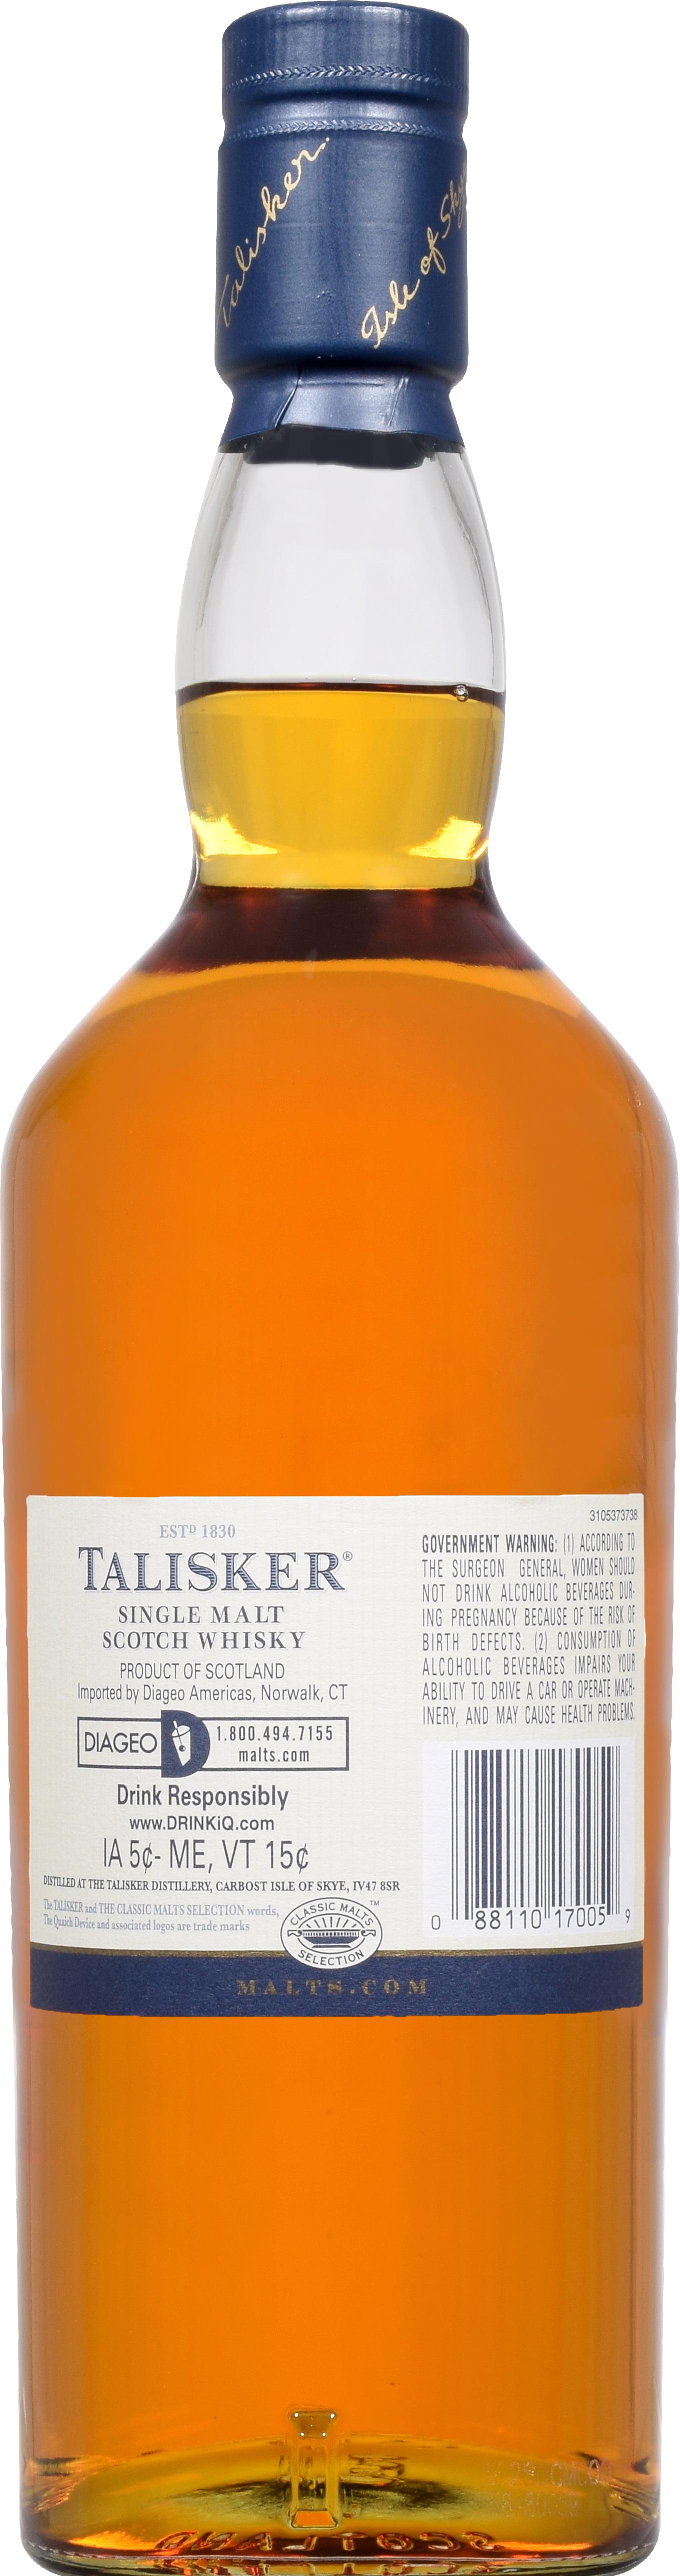 debeb3d56 Talisker Single Malt Scotch Whisky